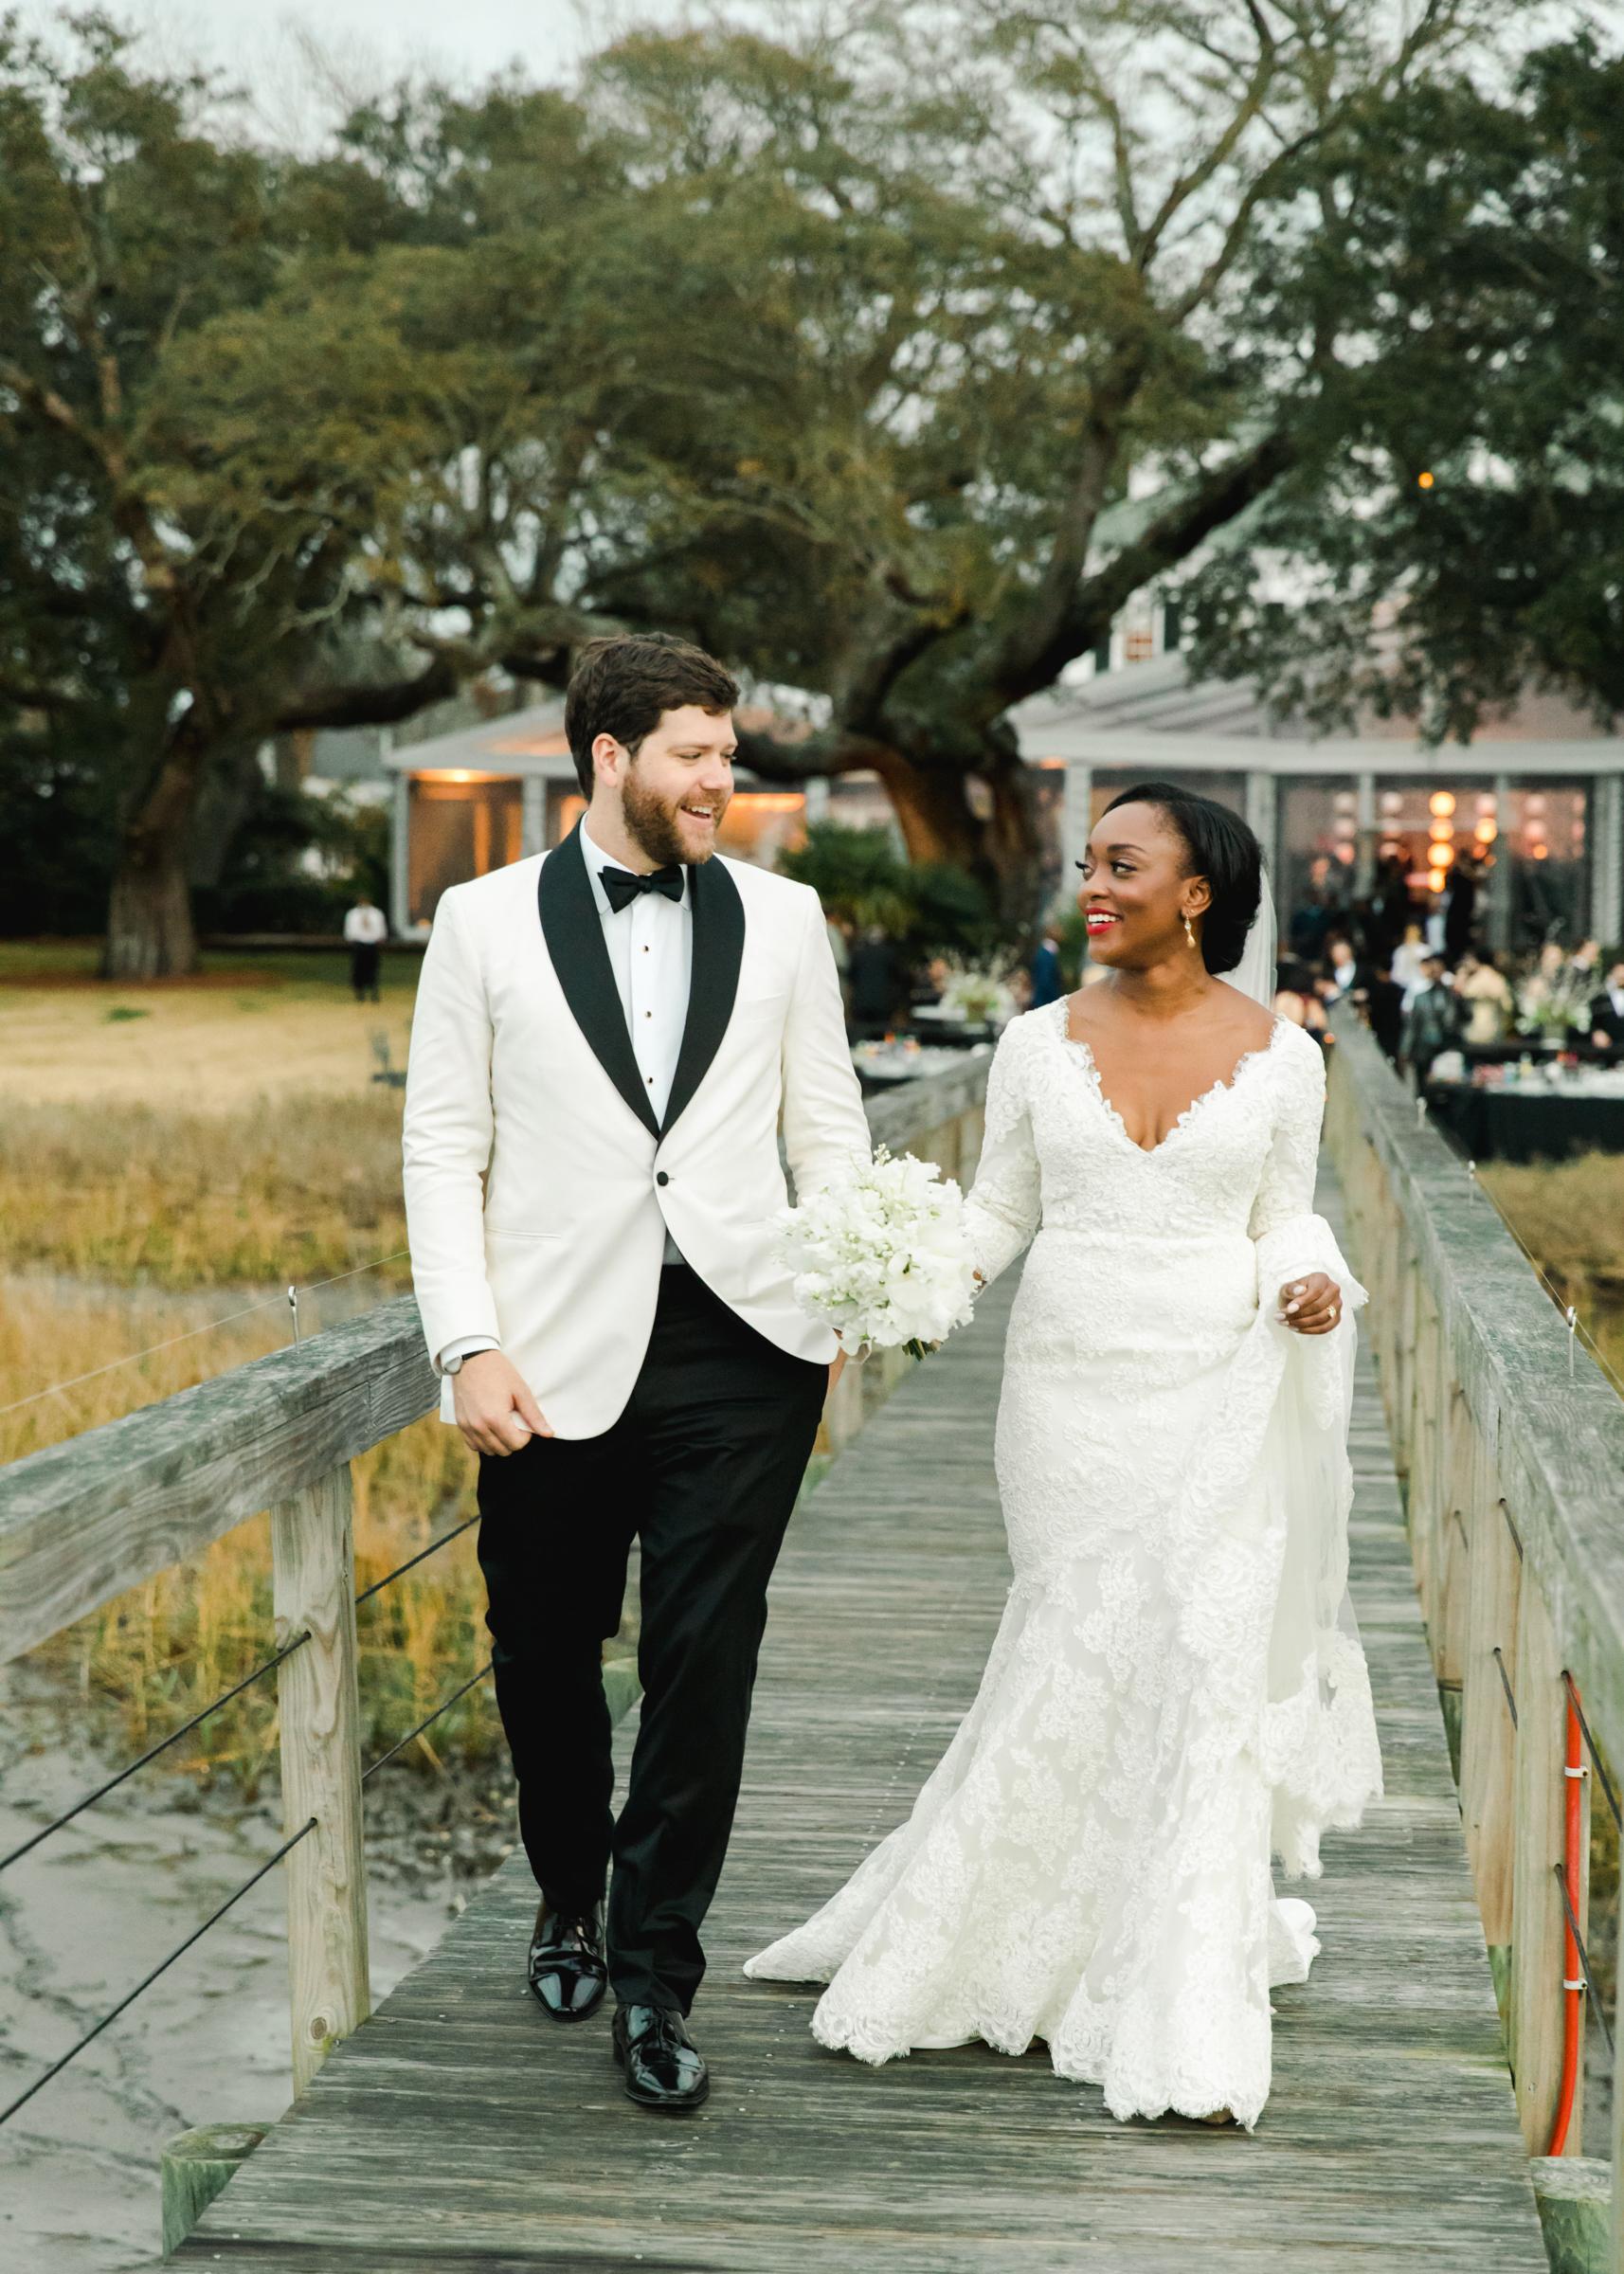 hamida charlie charleson wedding couple dock